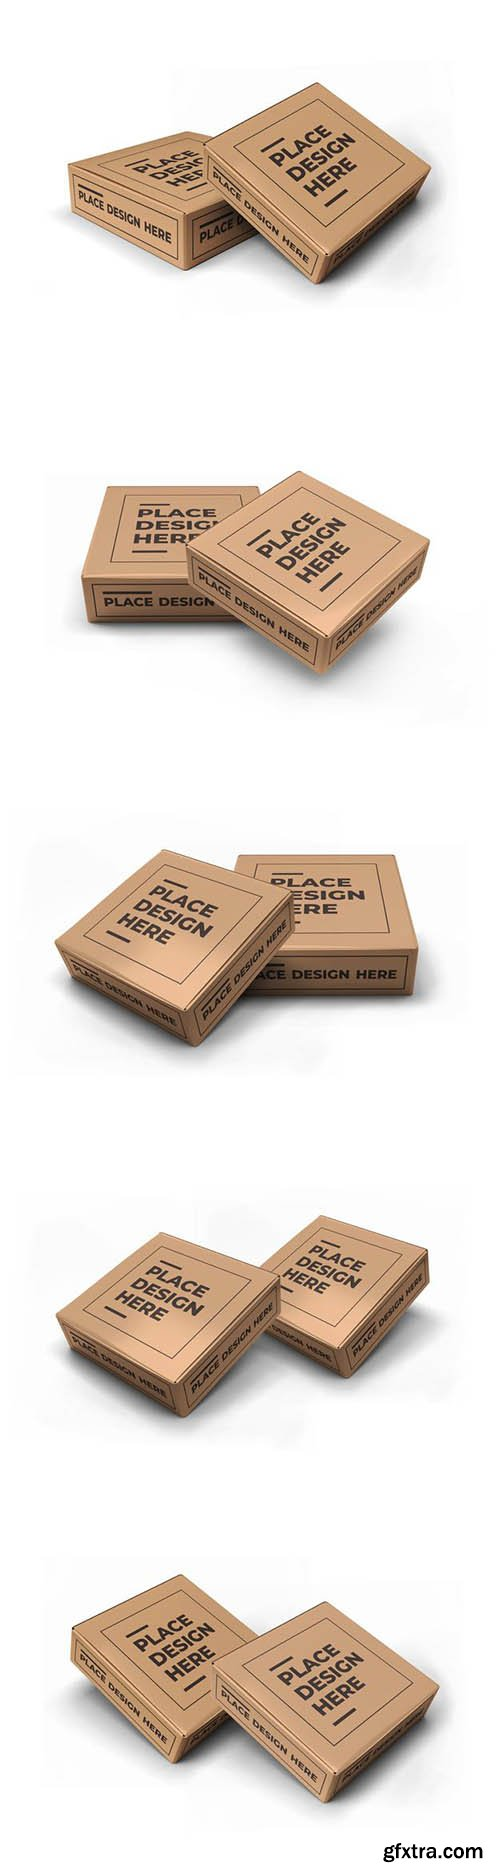 Small square box packaging mockup